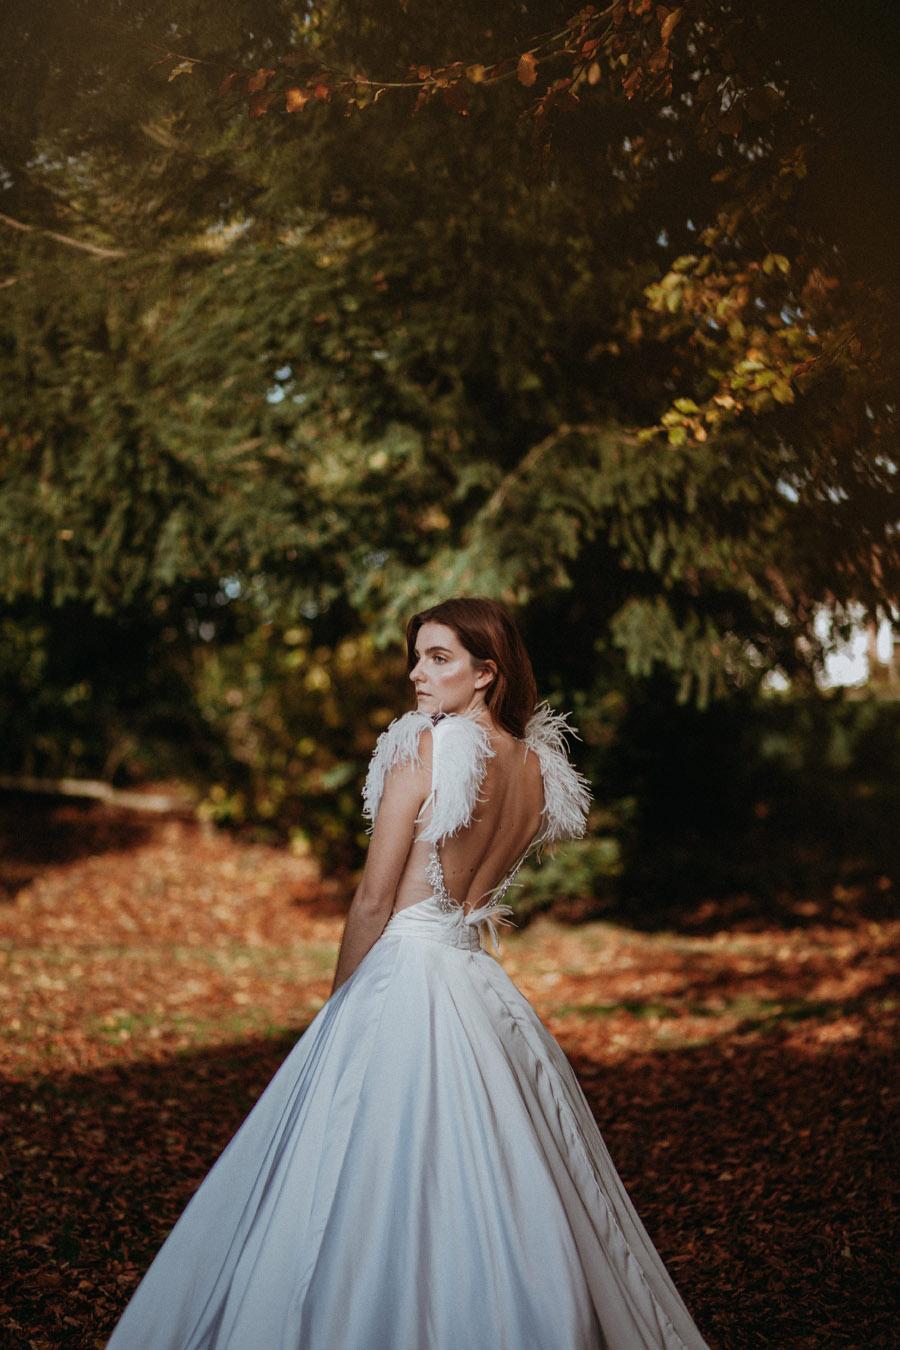 Sanyukta Shrestha autumn daydream bridal collection 2020 (12)